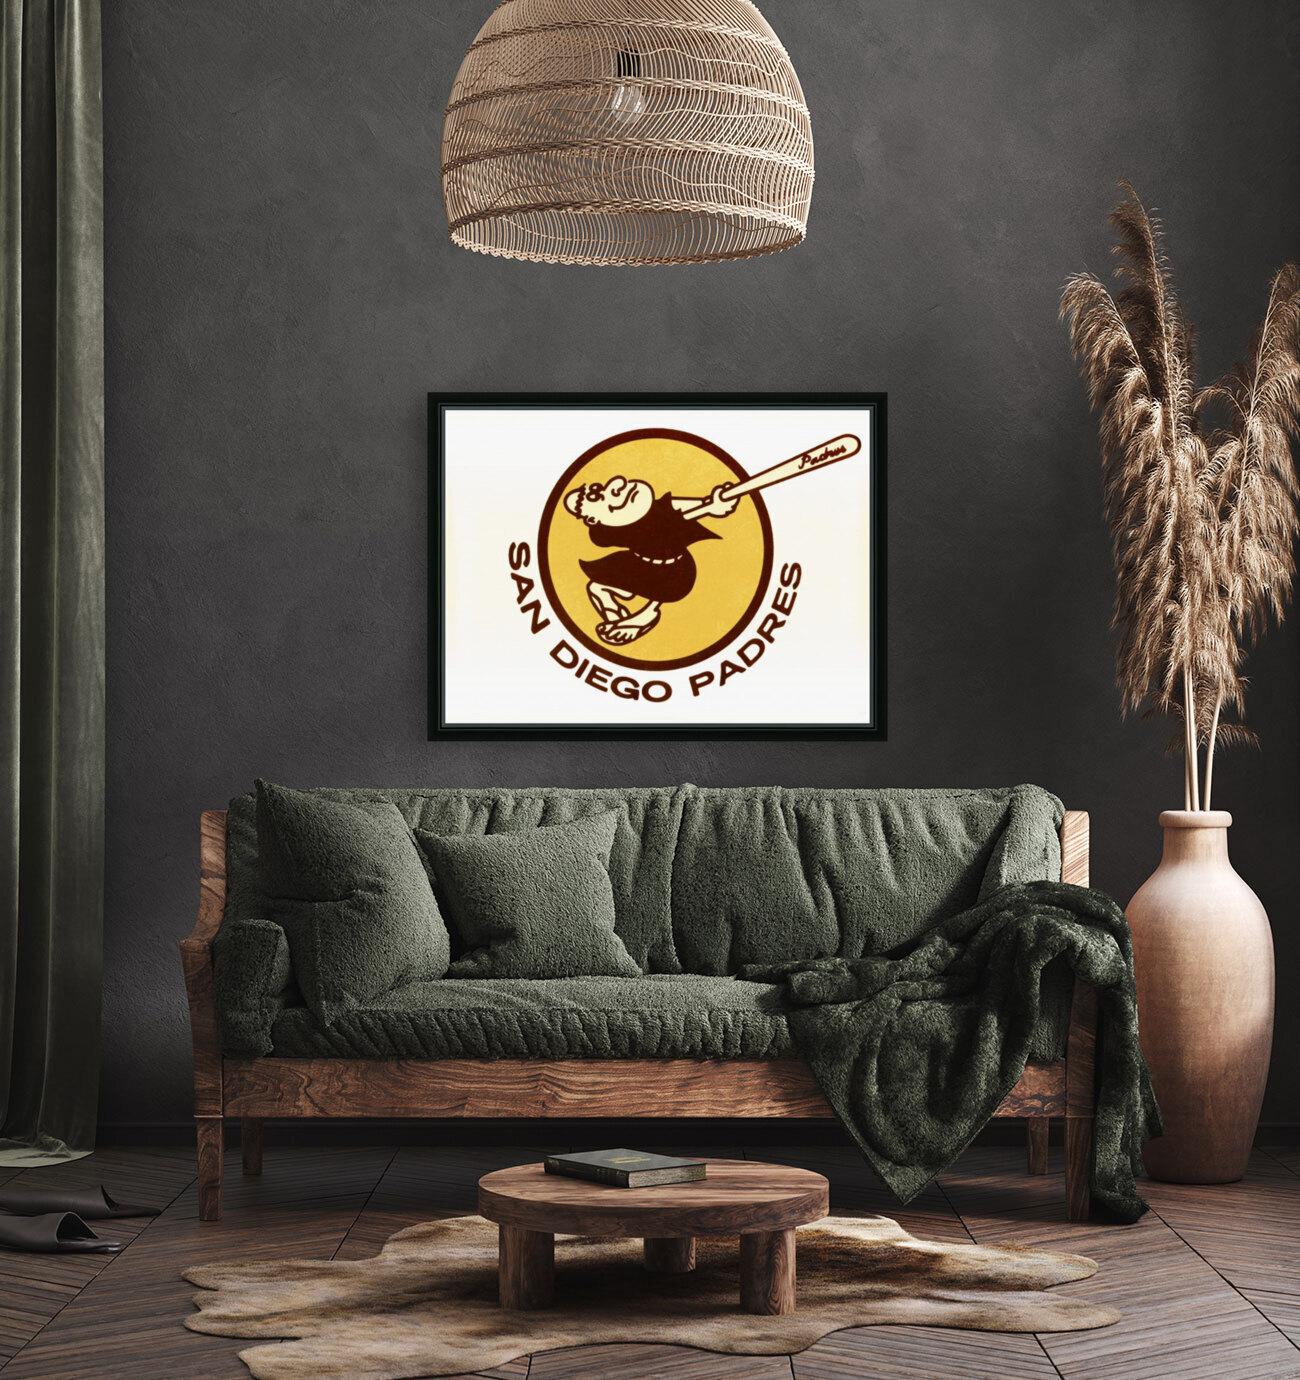 1980 san diego padres logo wall art  Art